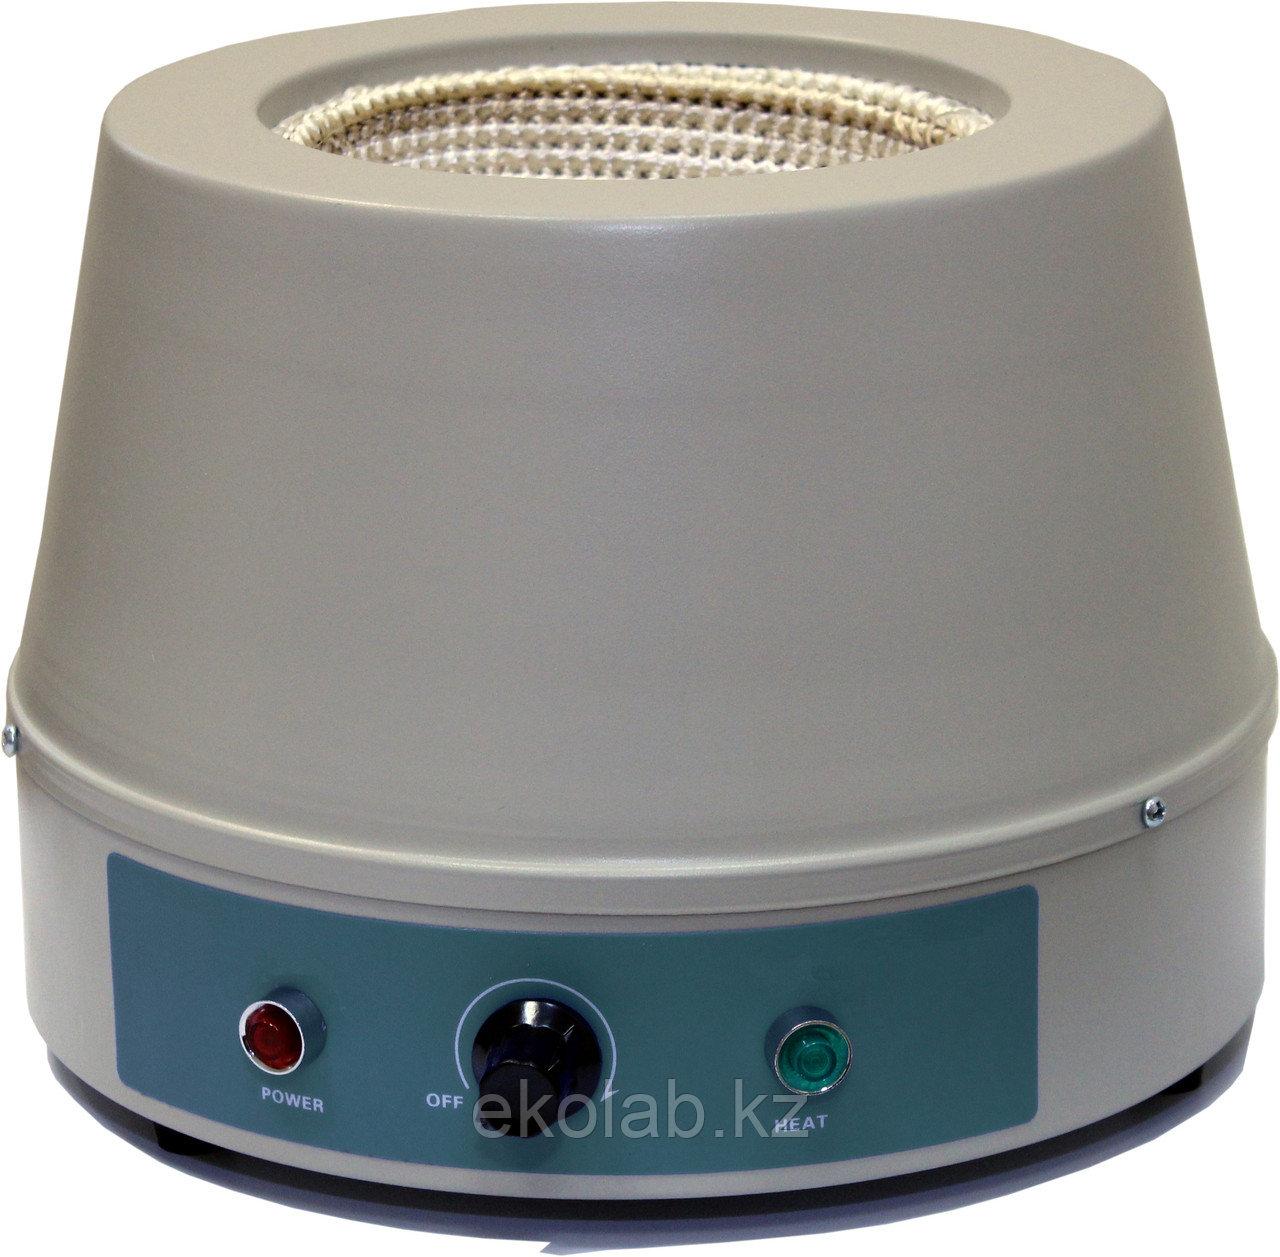 Колбонагреватель Stegler КН-1000 (1000 мл до +450 °C)